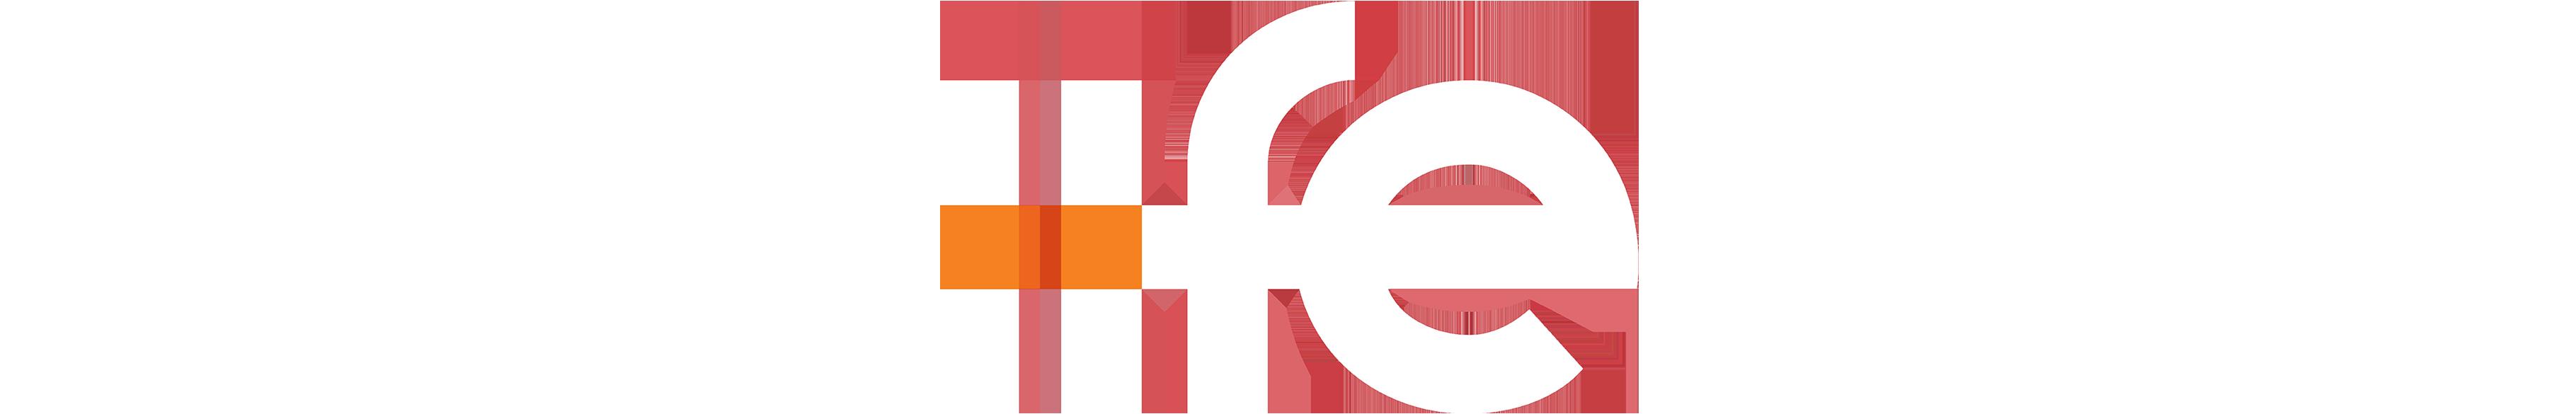 3. IIFE (1)